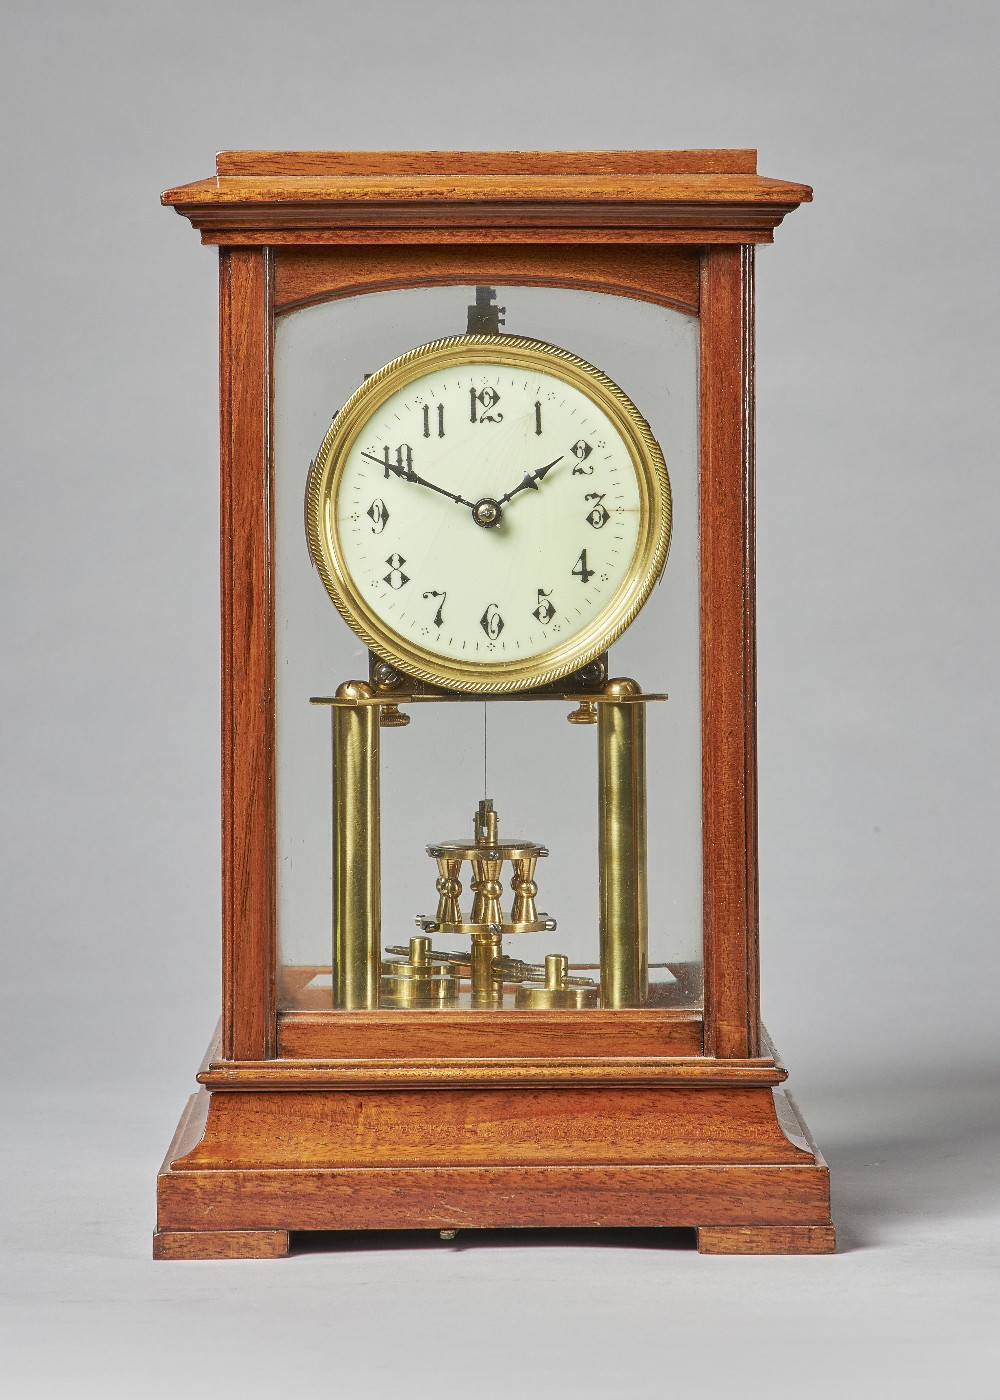 Lot 709 - A mahogany cased torsion timepiece By Gustav Becker, Freiburg,